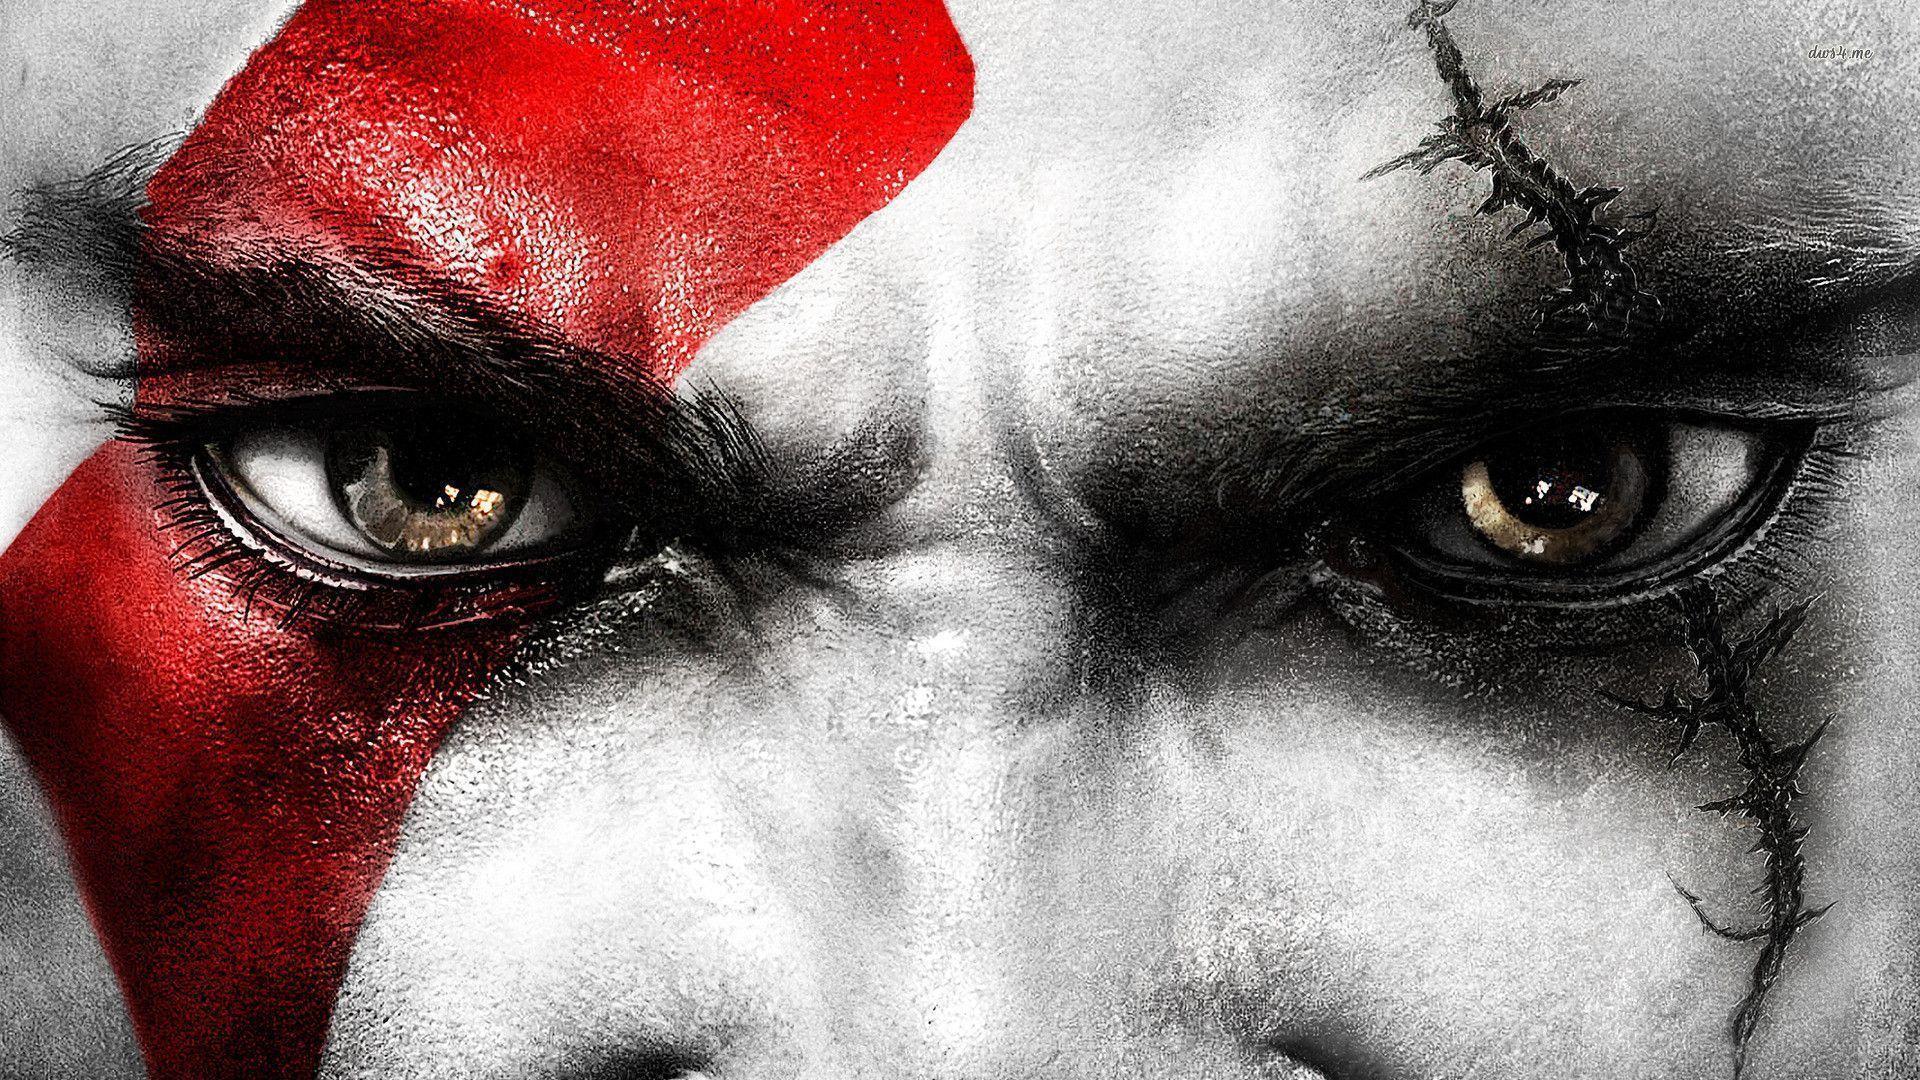 Kratos - God of War 3 wallpaper - Game wallpapers - #